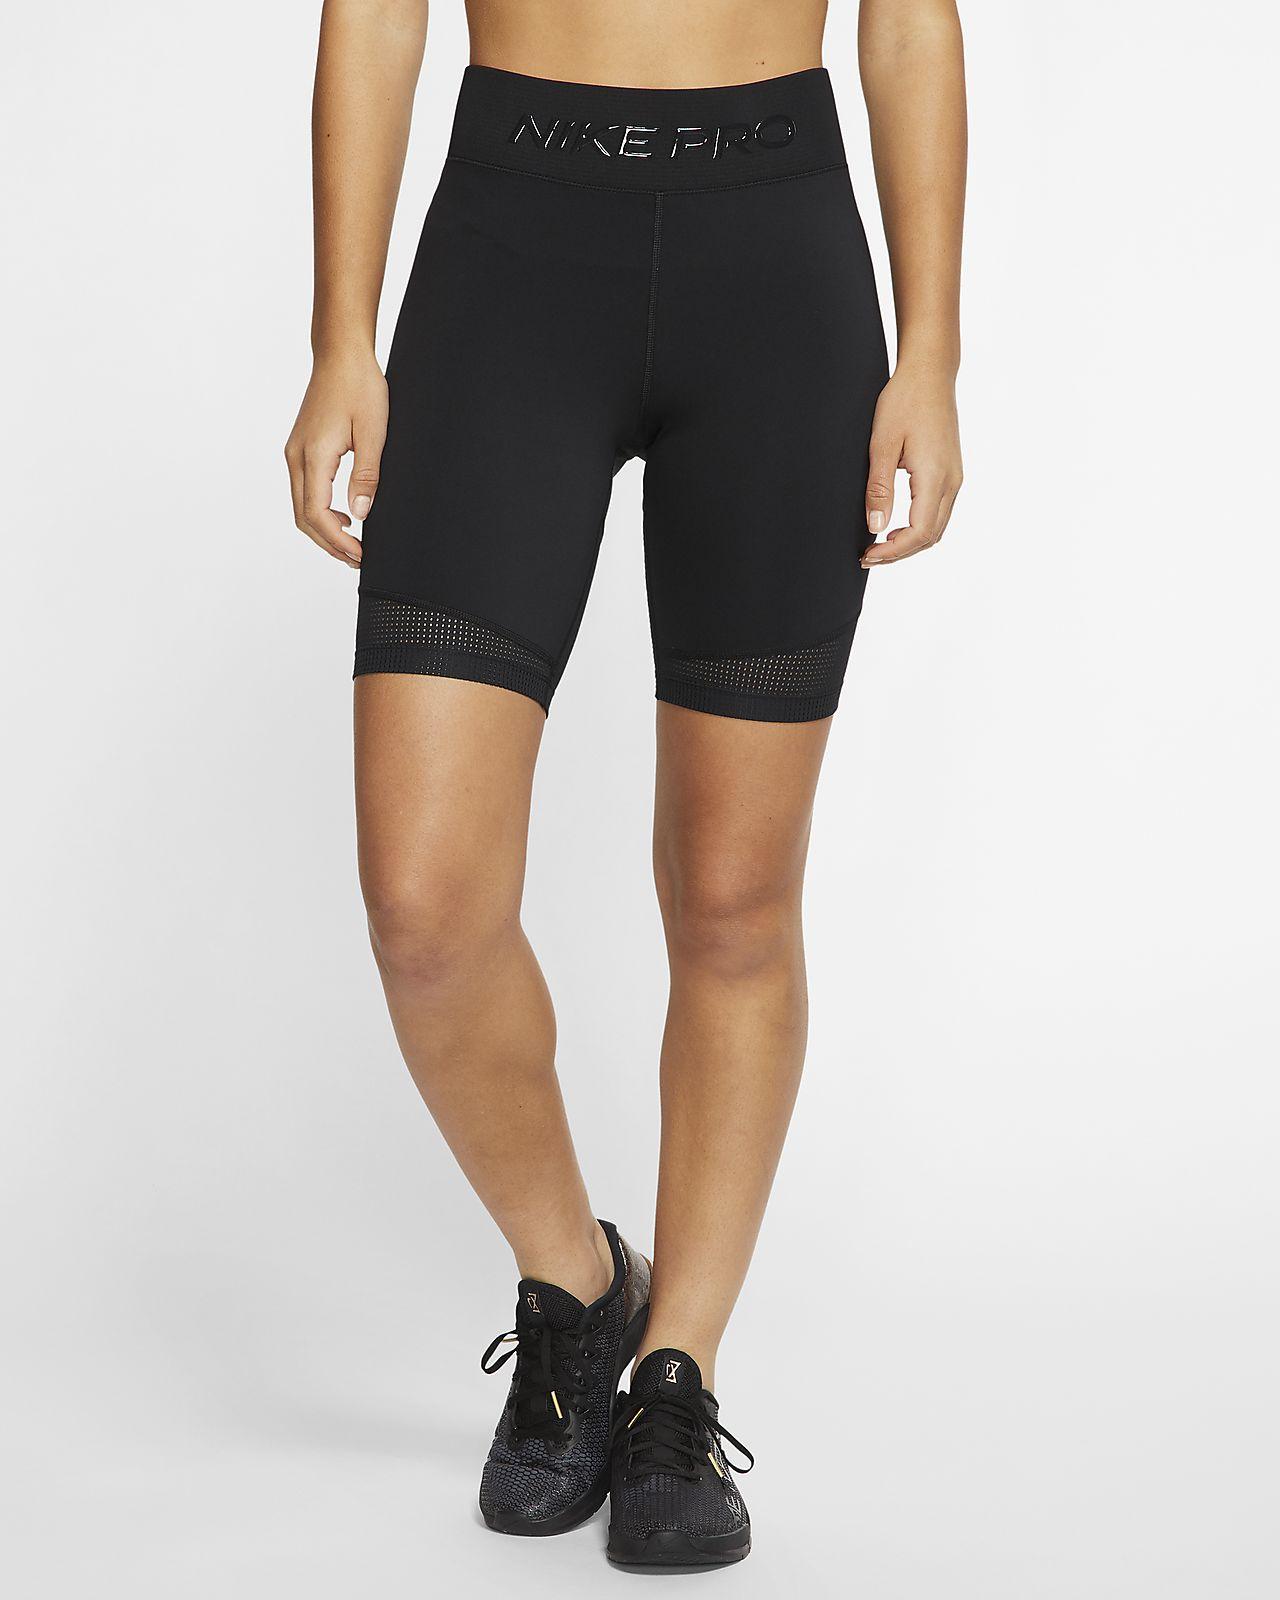 Nike Pro Women's 20cm (approx.) Shorts